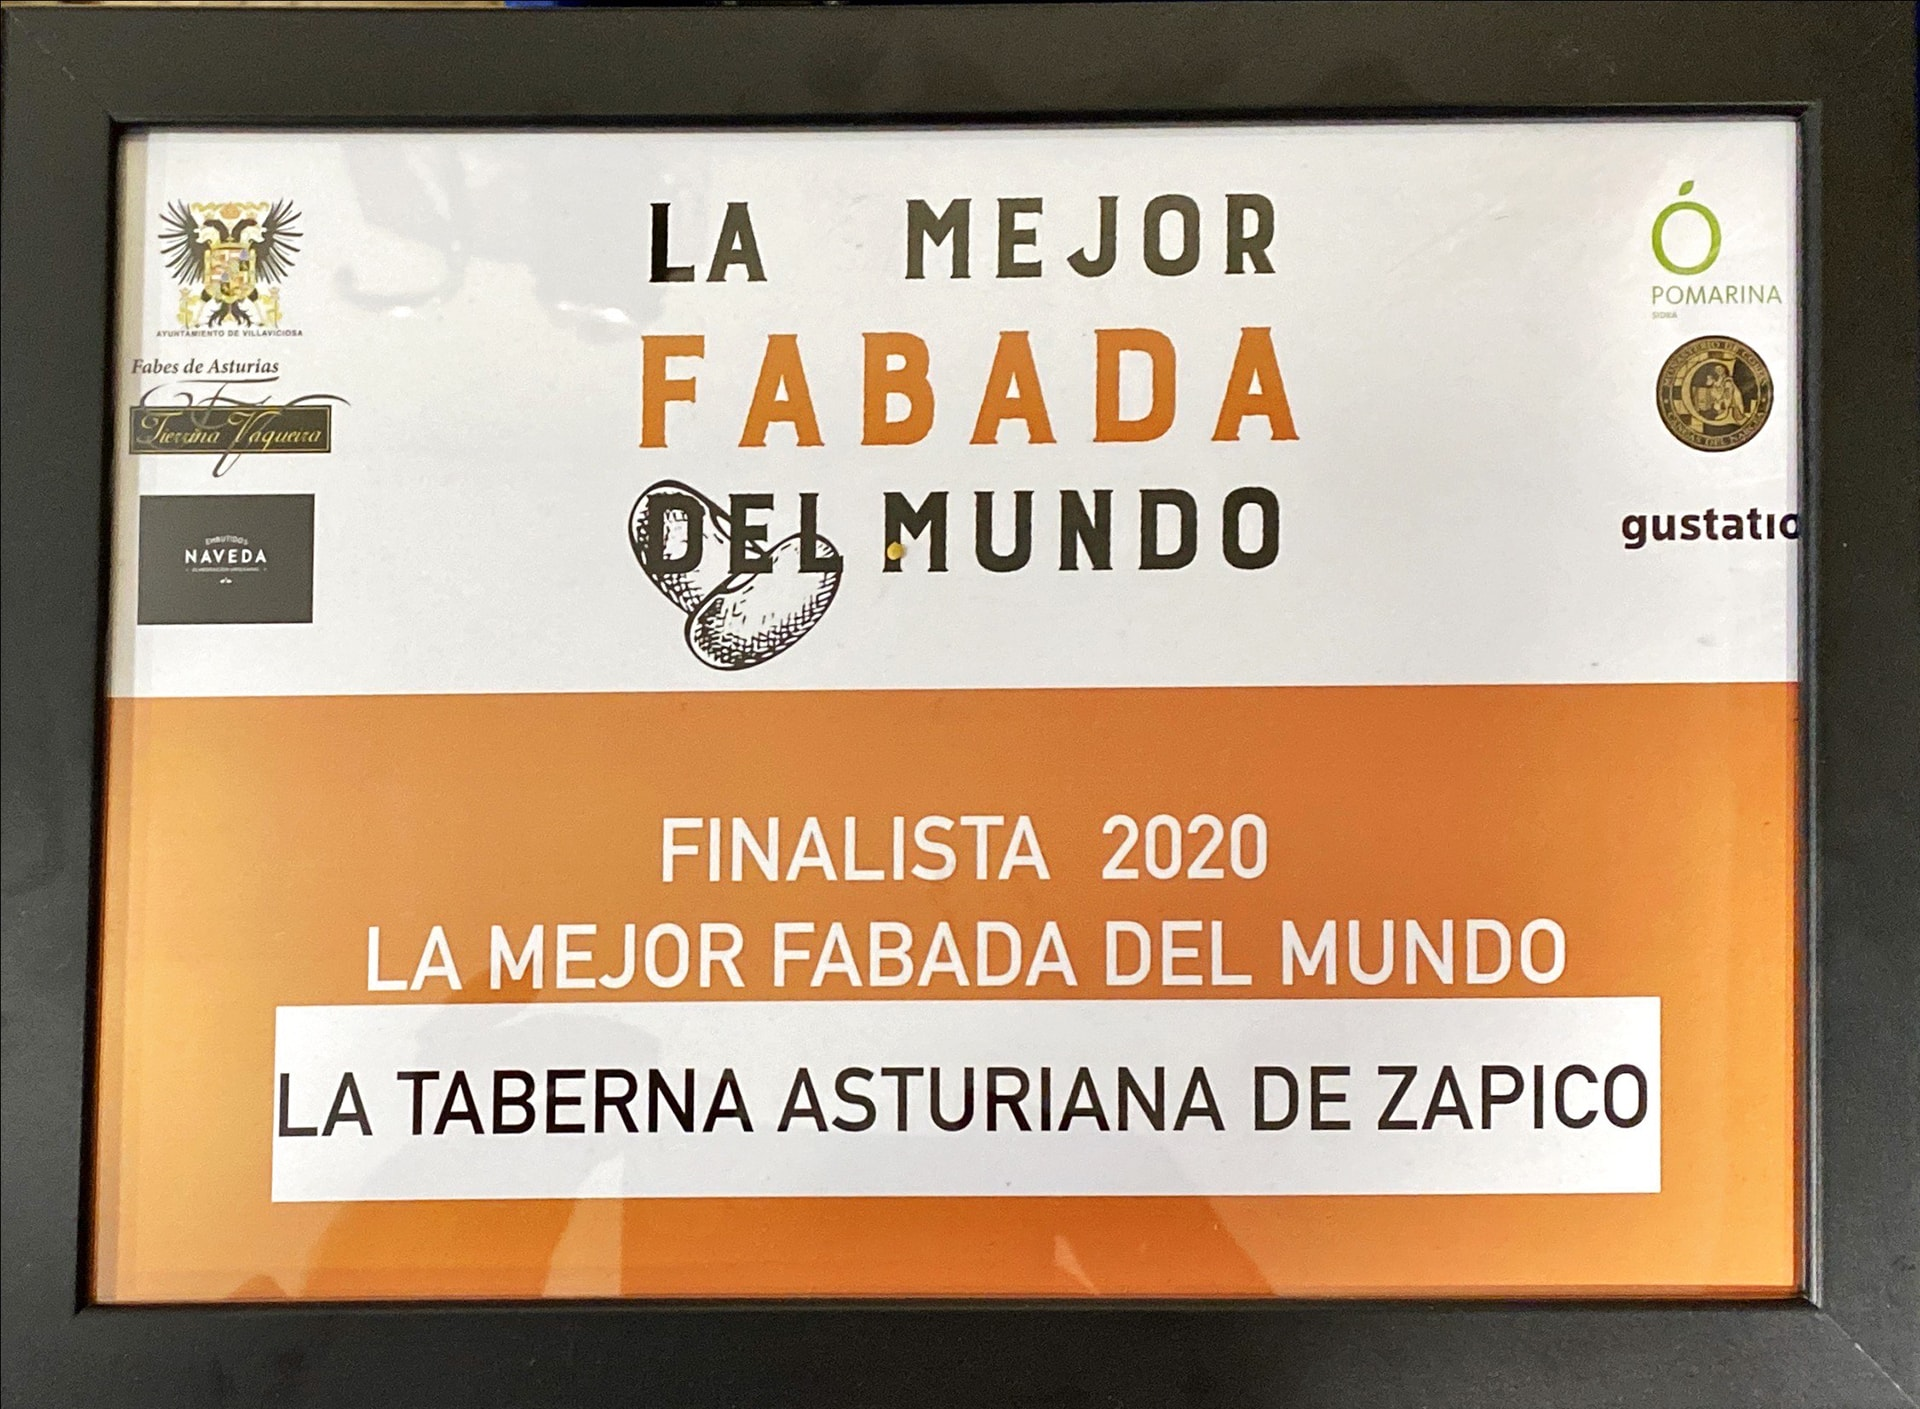 Finalista 2020 Mejor Fabada del Mundo - Taberna Asturiana Zapico